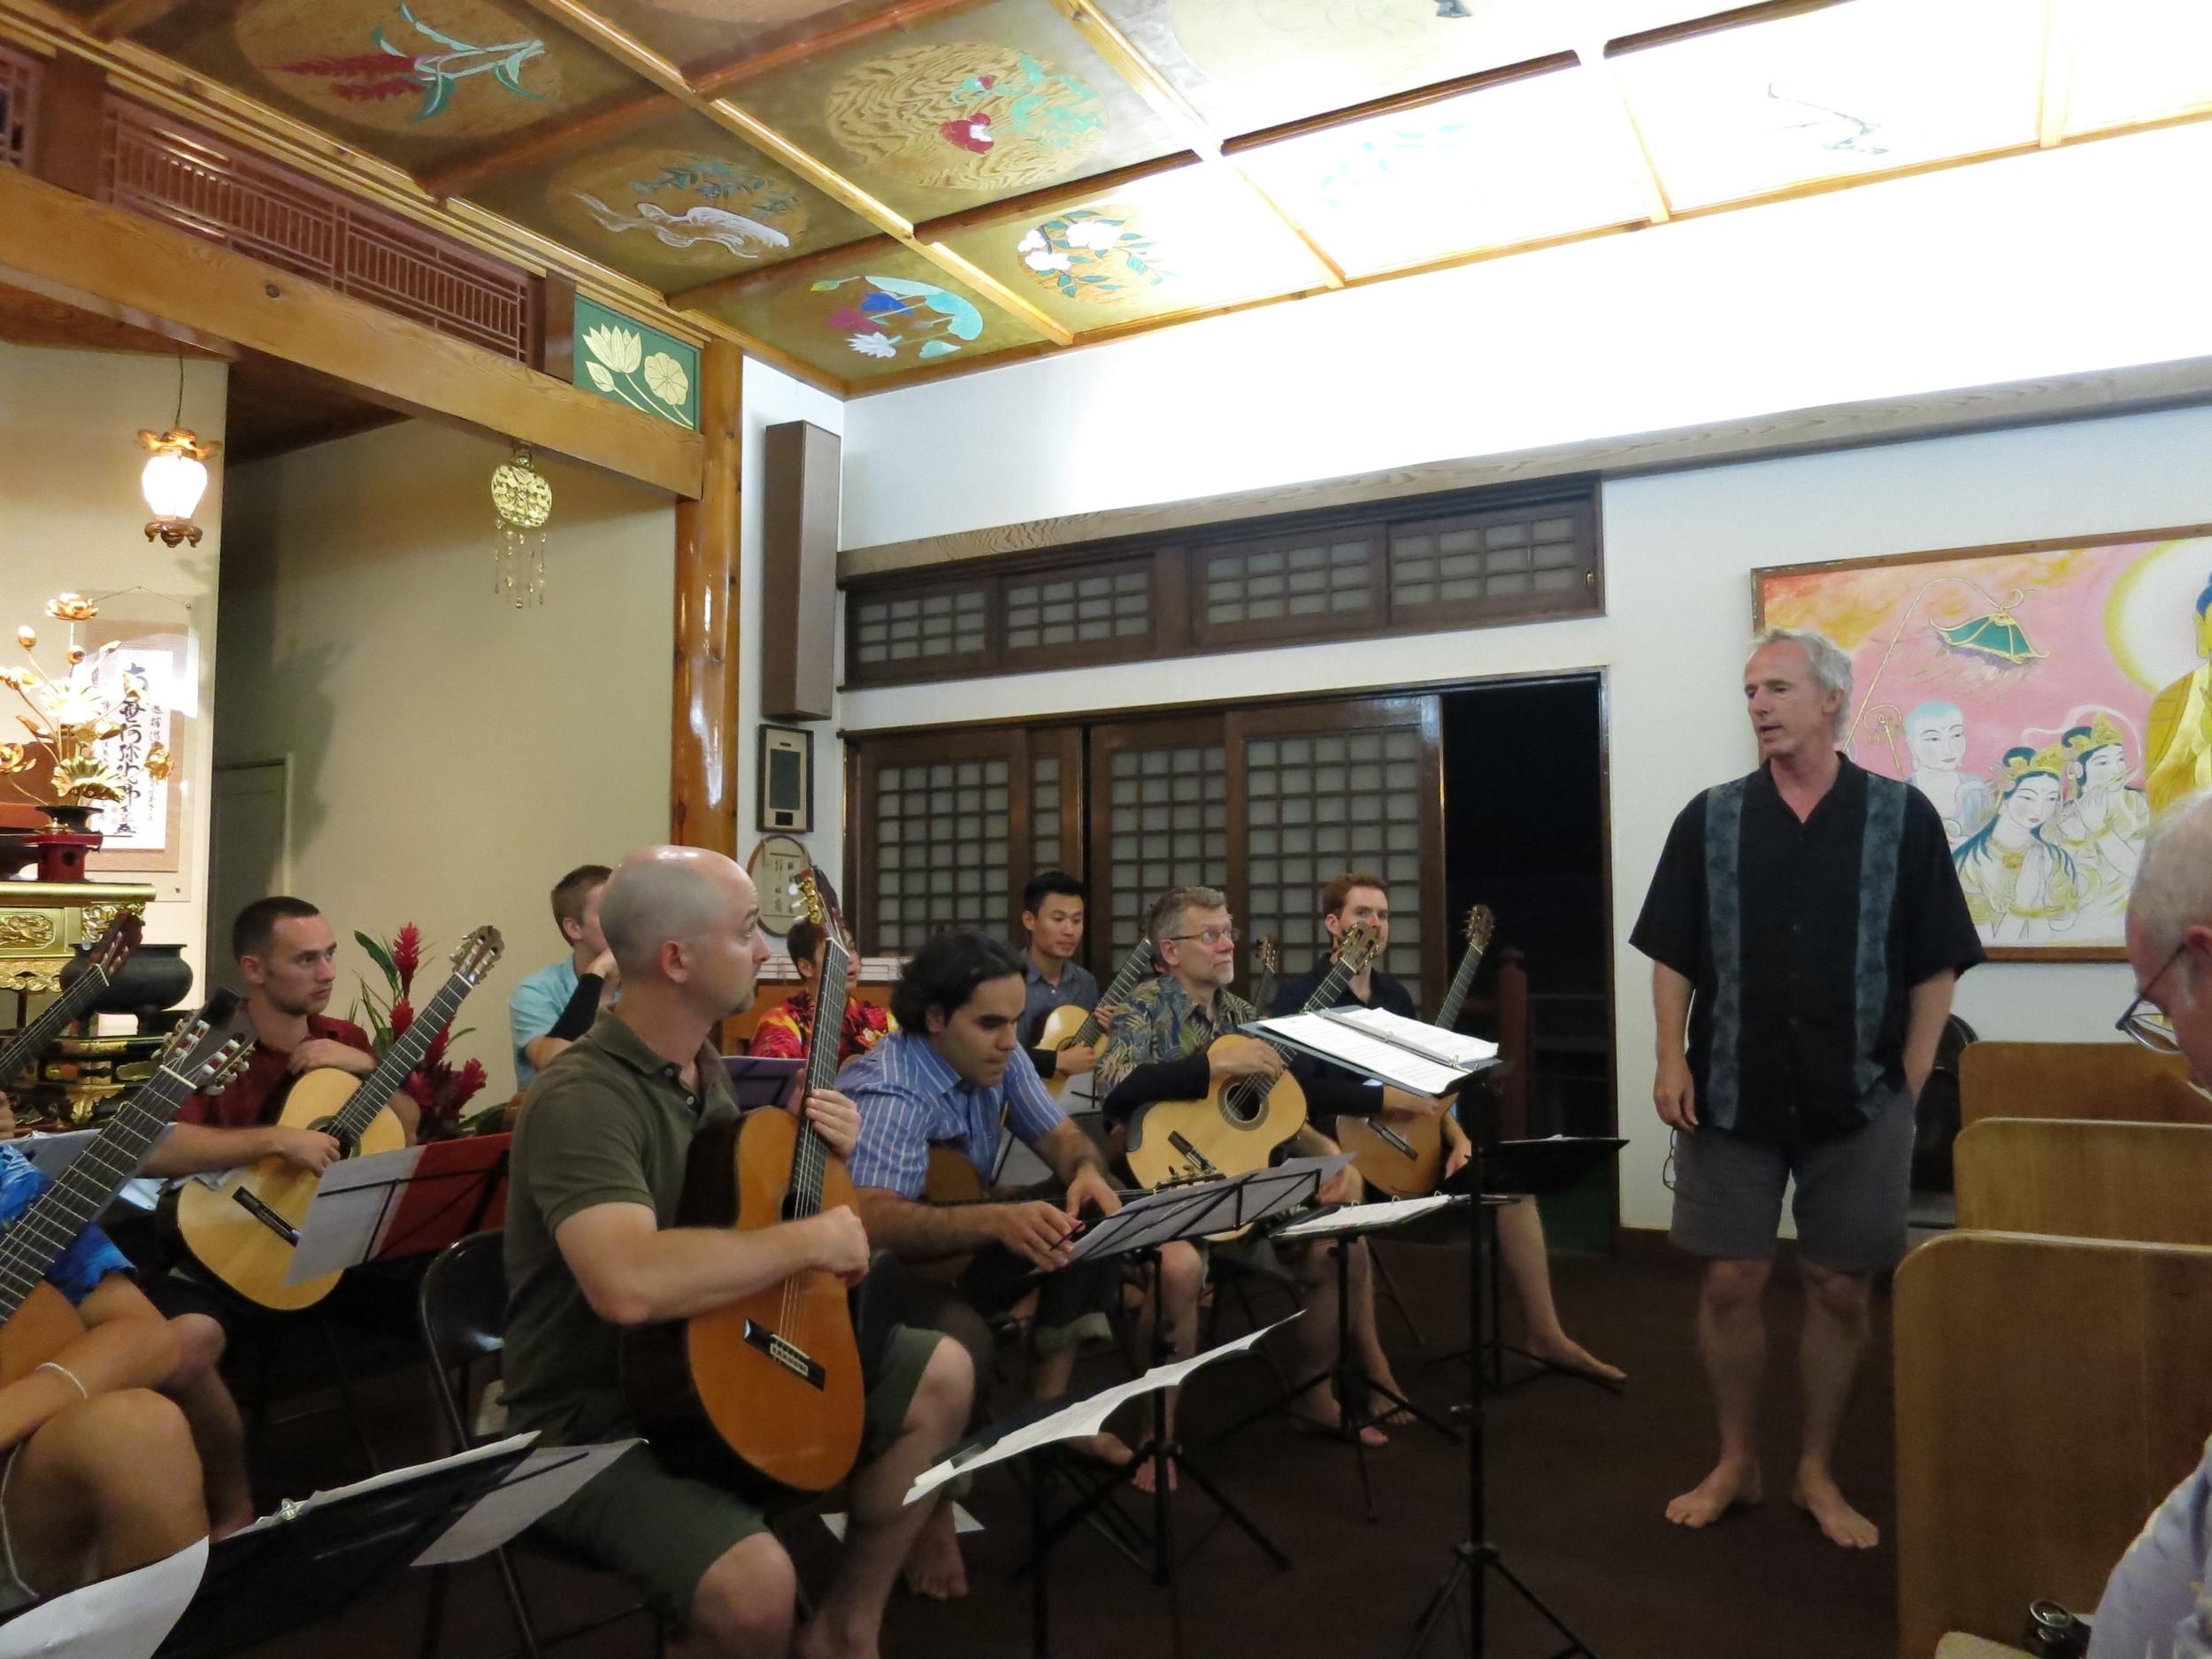 John Dearman rehearsing the guitar orchestra at the Lahaian Jodo Mission (2014)